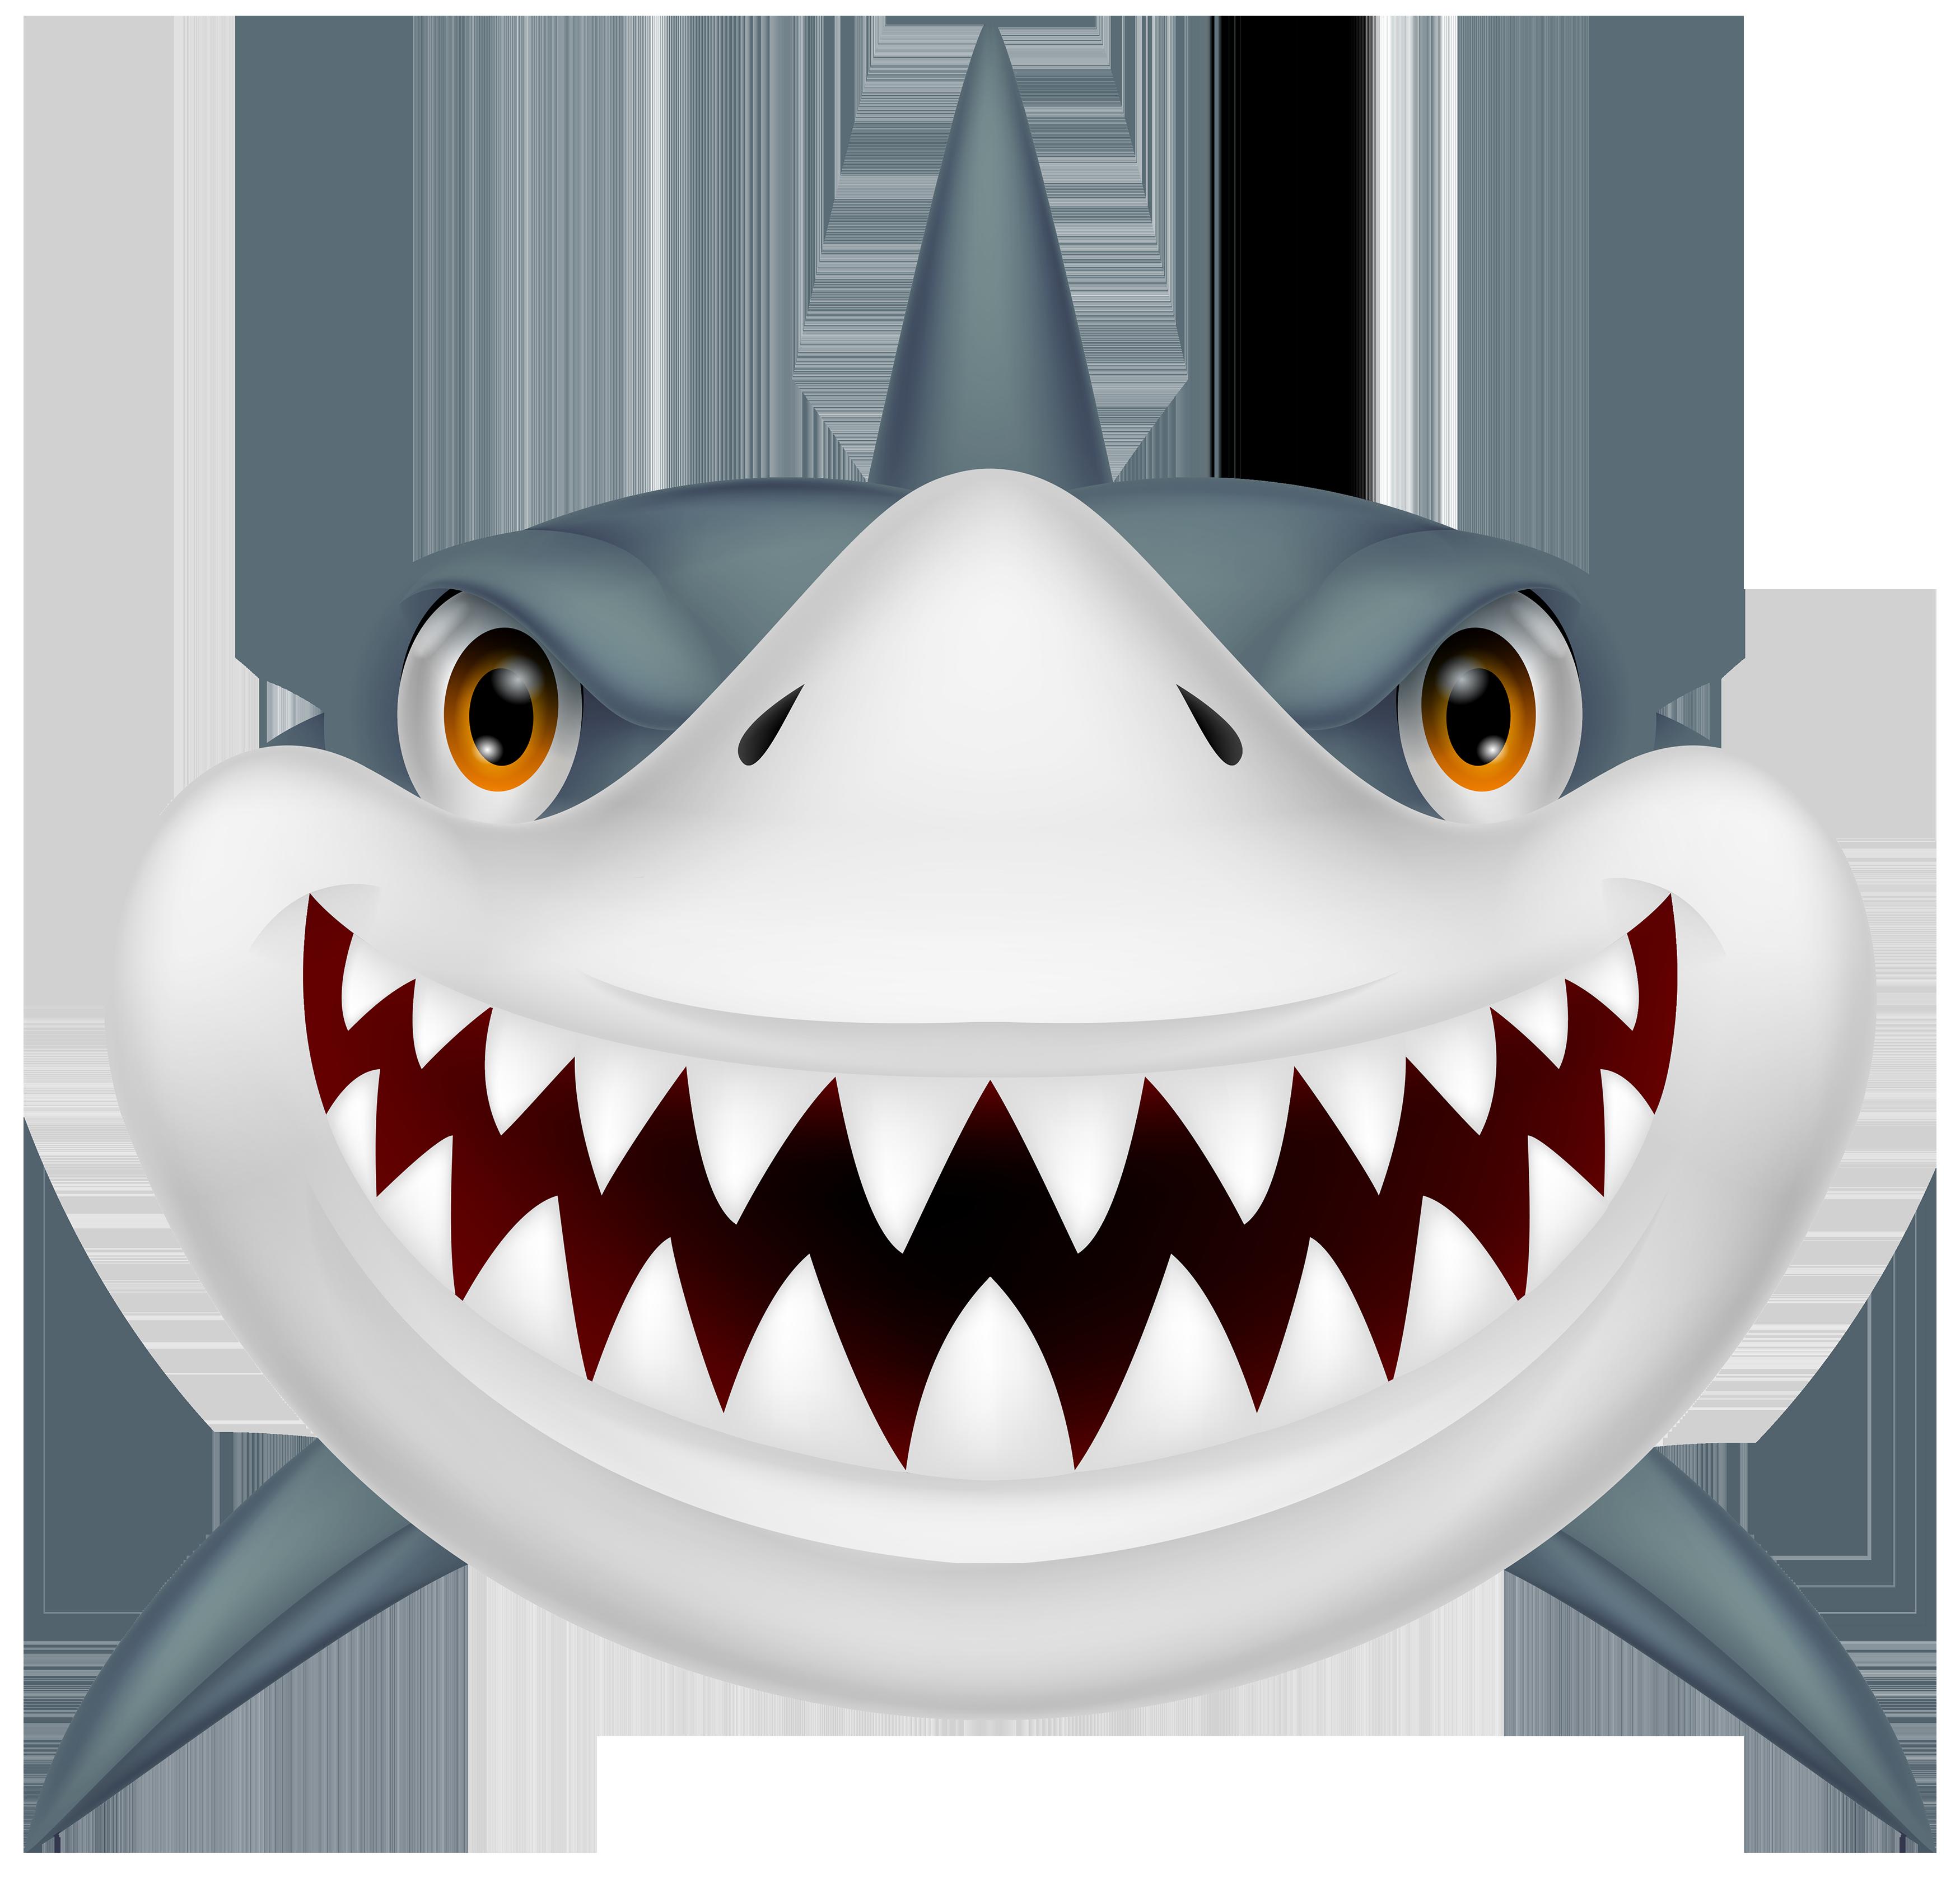 Free shark clipart cartoon png transparent Free Shark Images | Free download best Free Shark Images on ... png transparent